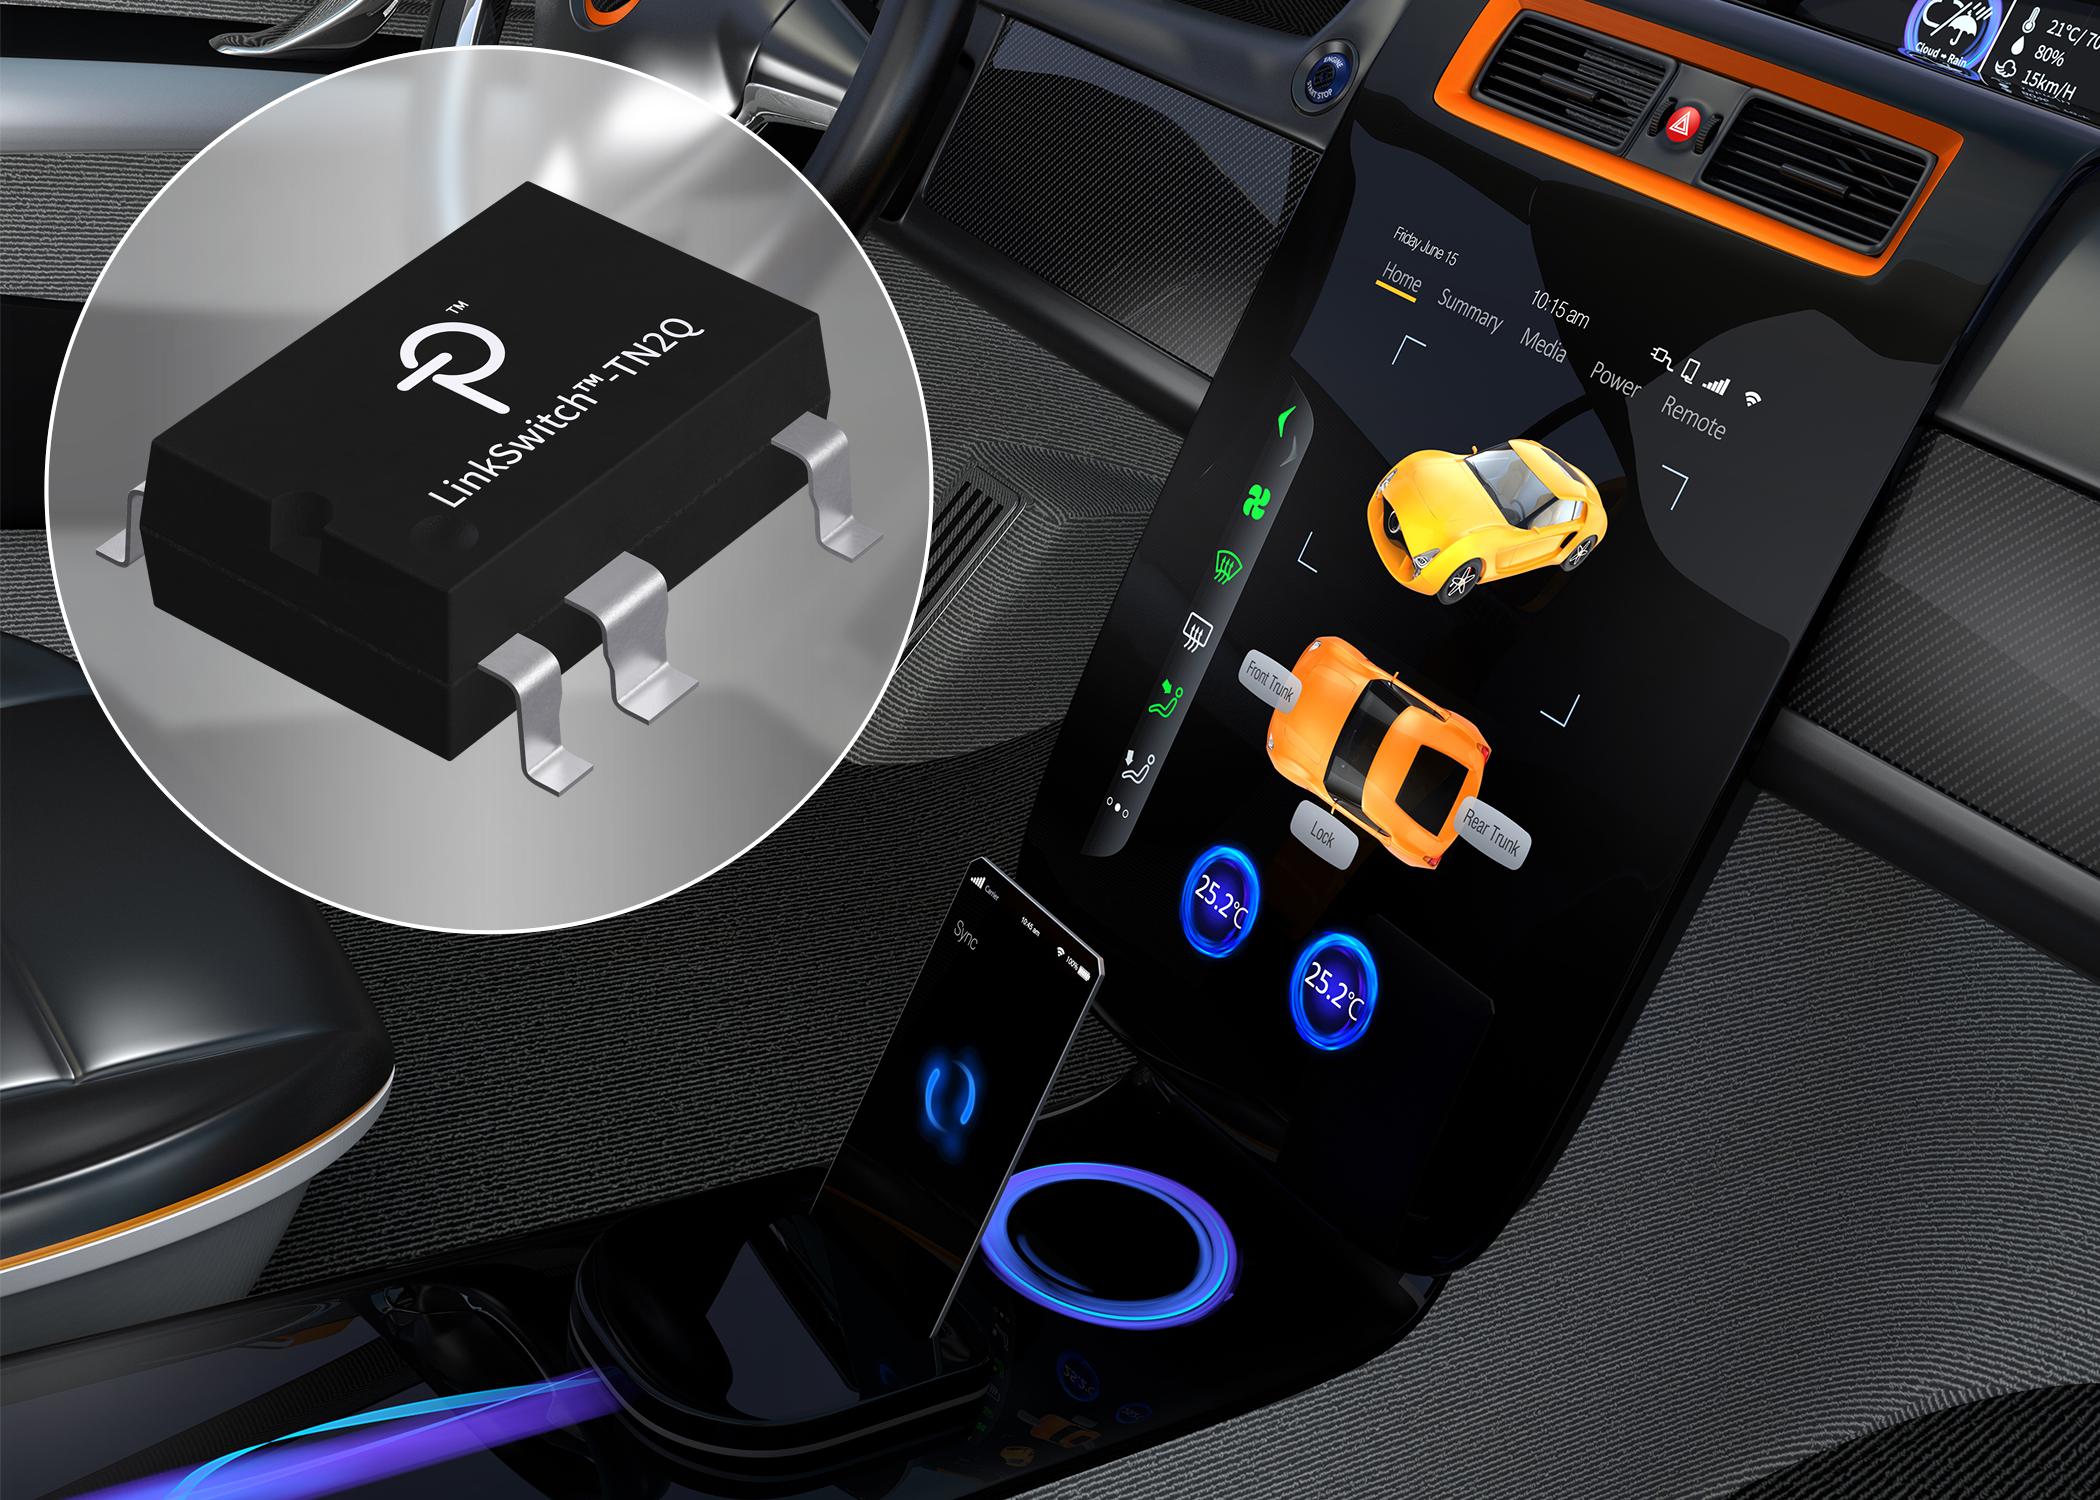 Power Integrations推出的LinkSwitch-TN2高压开关IC现已通过汽车级认证